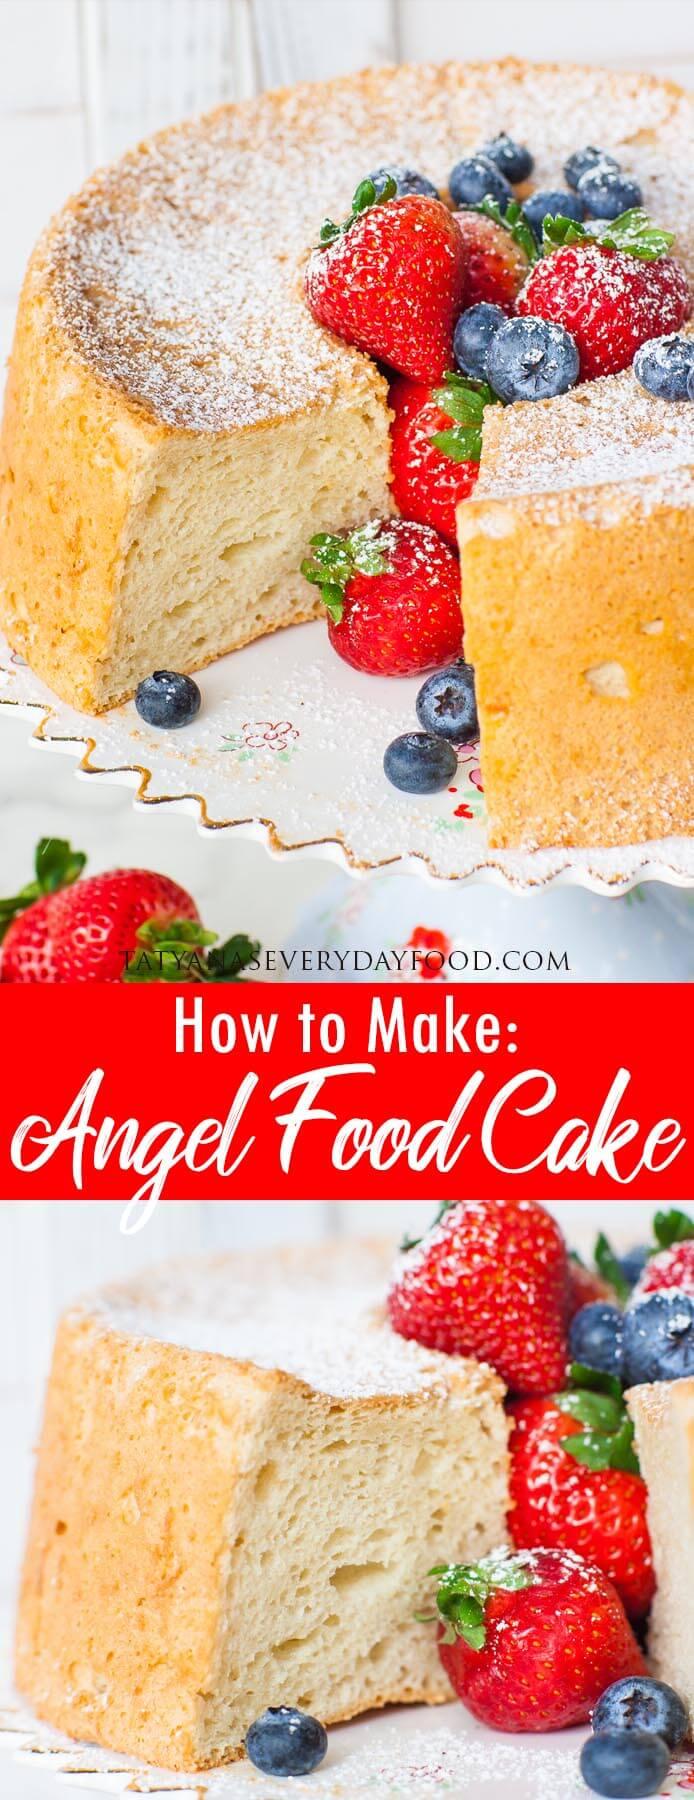 How to Make Angel Food Cake video recipe